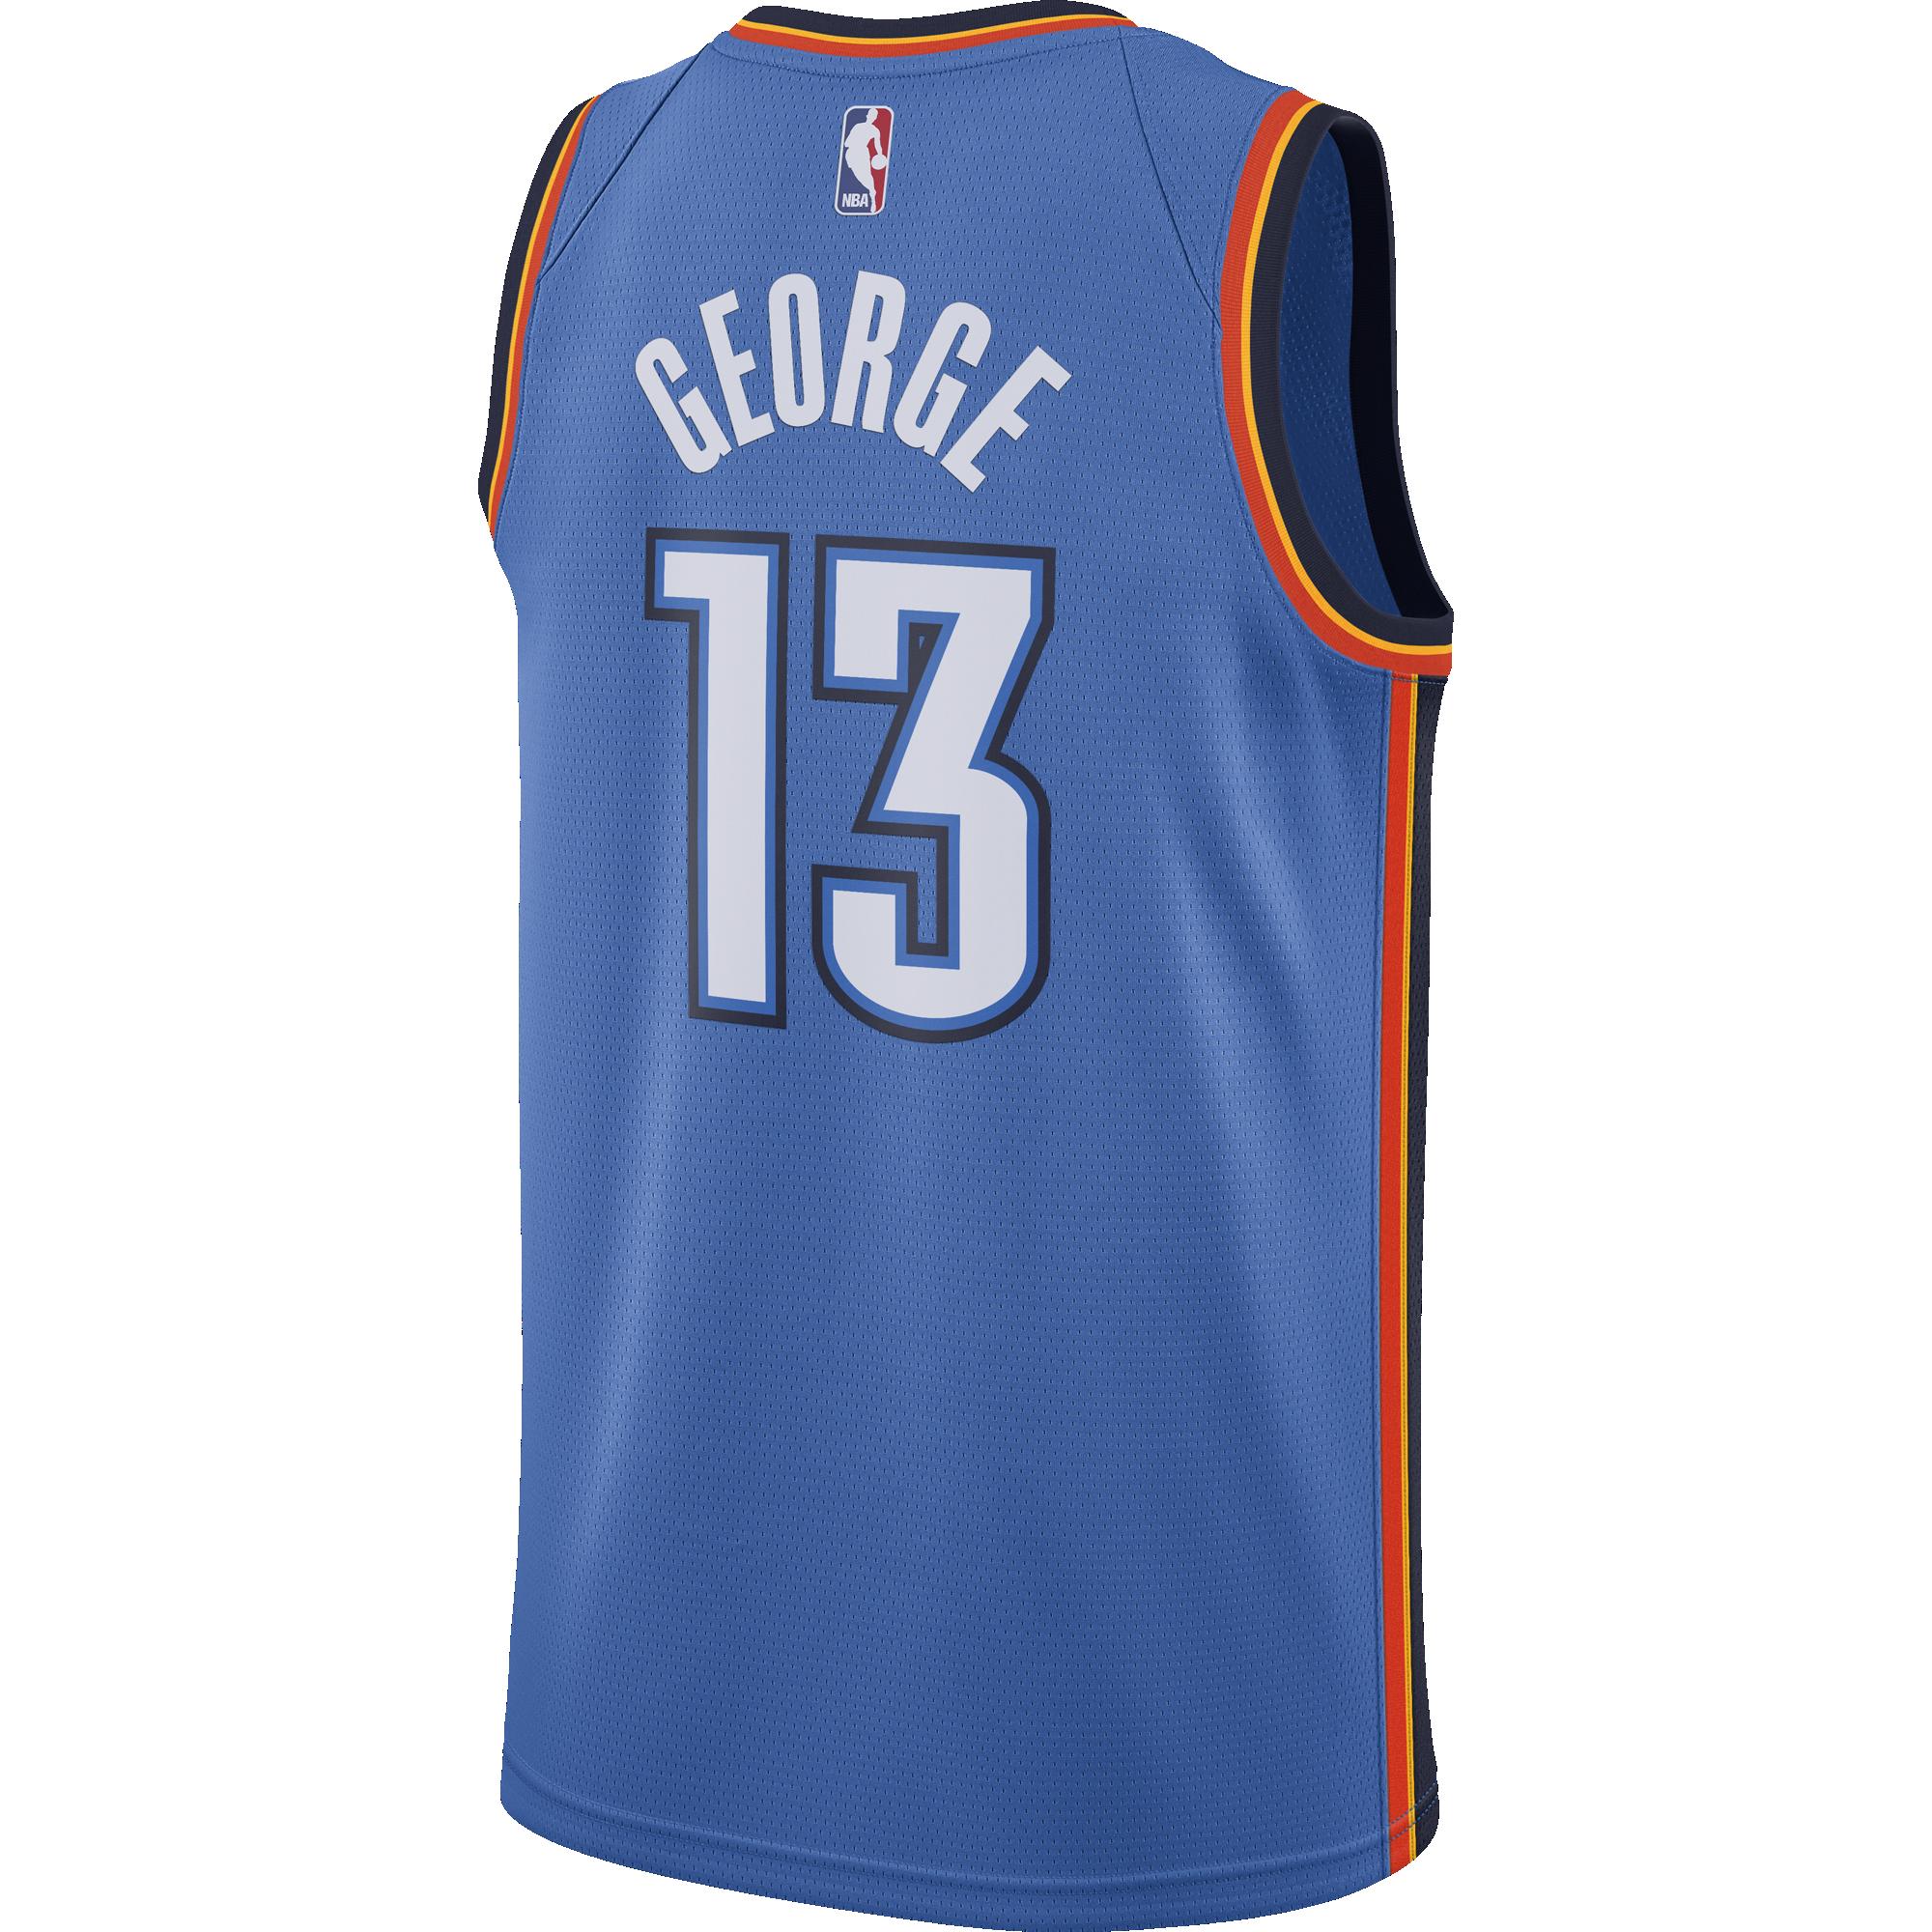 best loved 69836 57a57 NIKE NBA OKLAHOMA CITY THUNDER PAUL GEORGE ROAD SWINGMAN ...